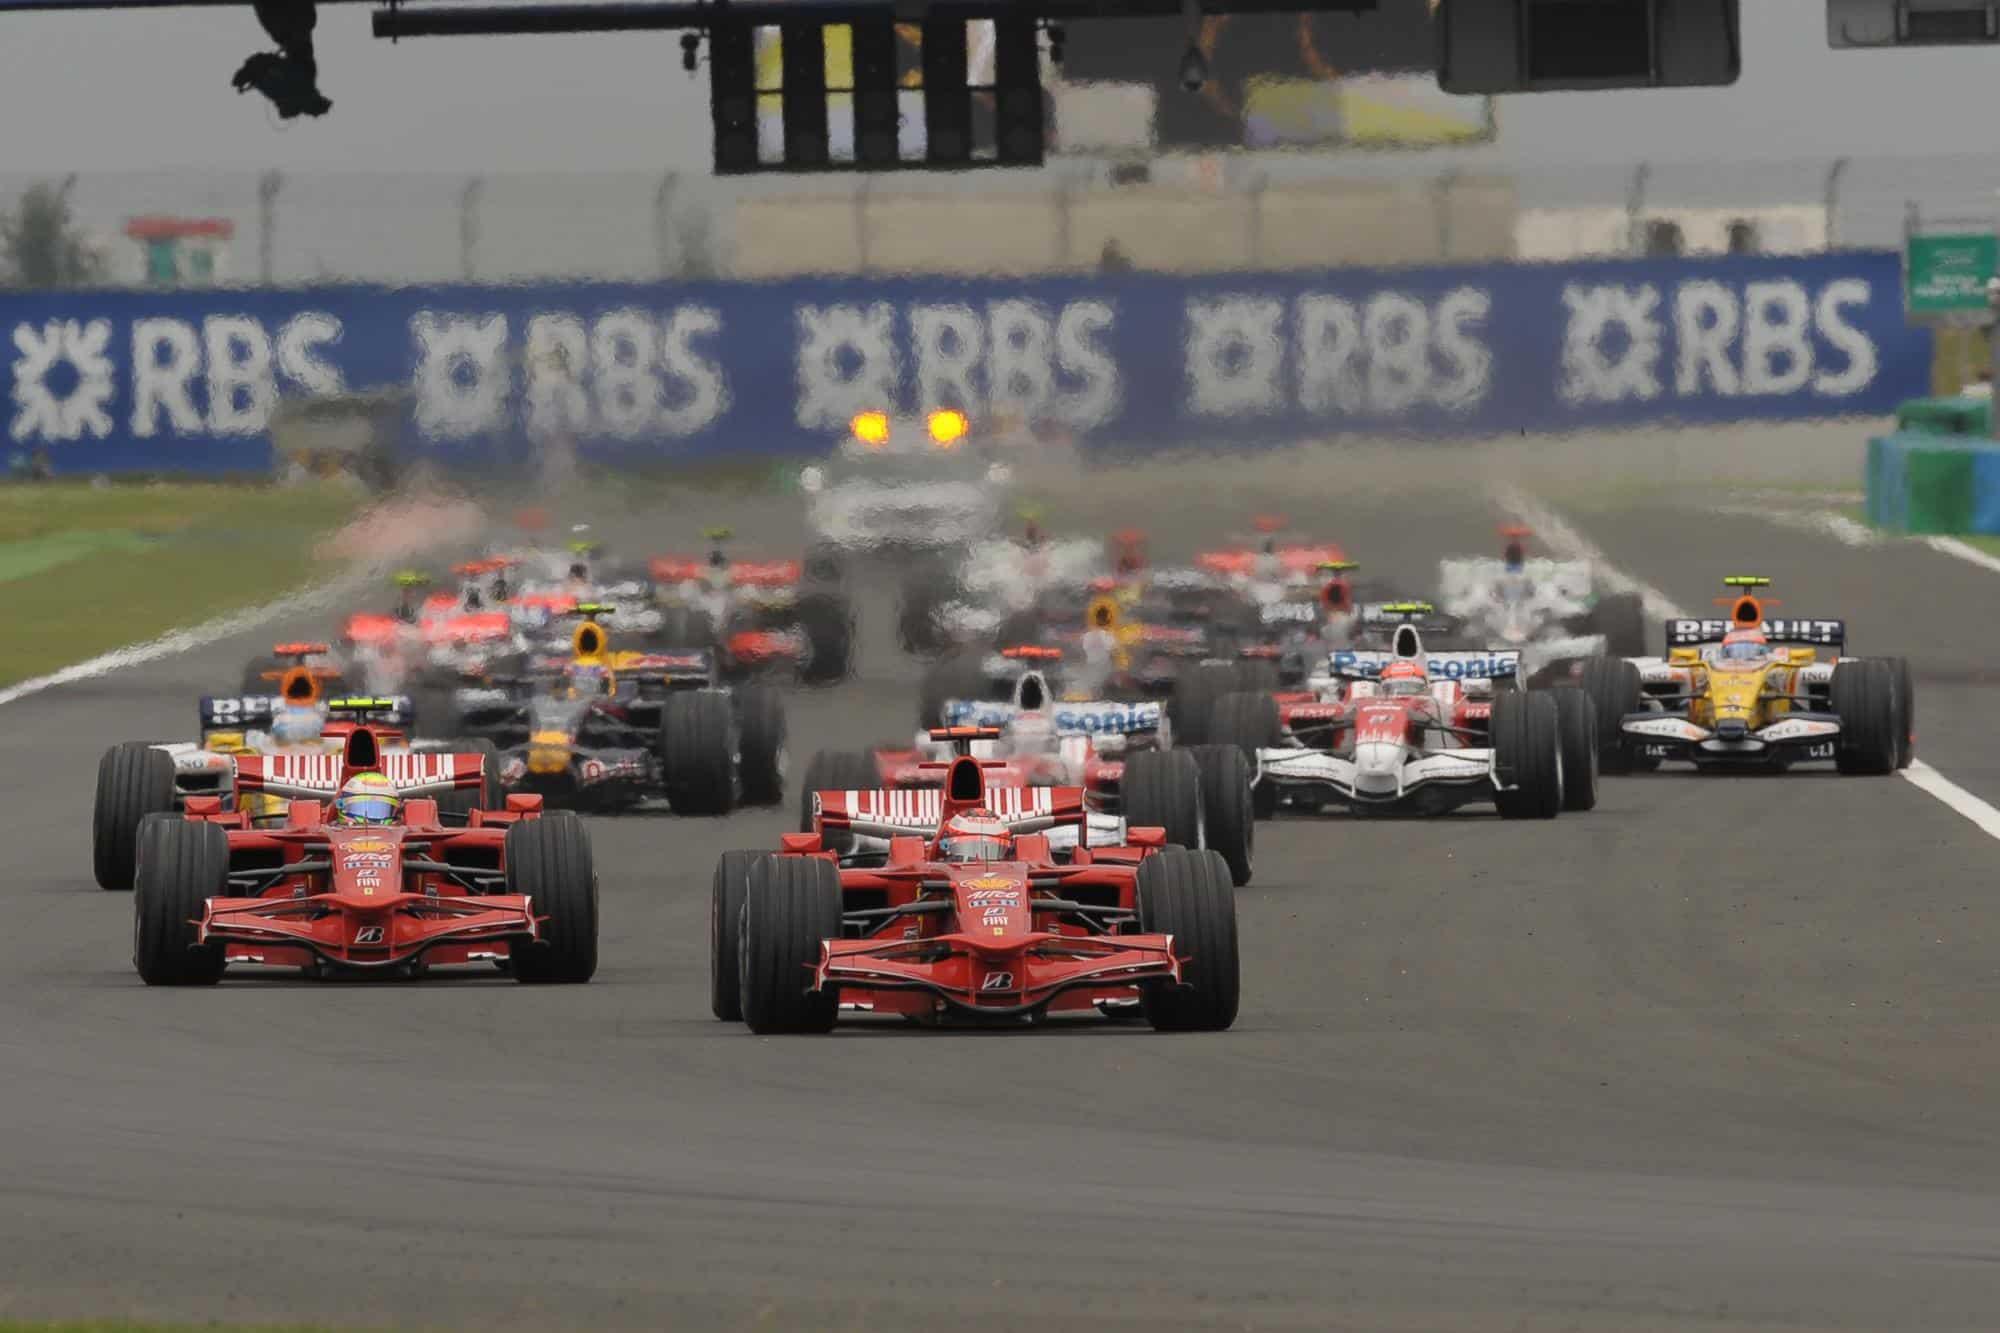 Formula 1 announces 2020 F1 schedule